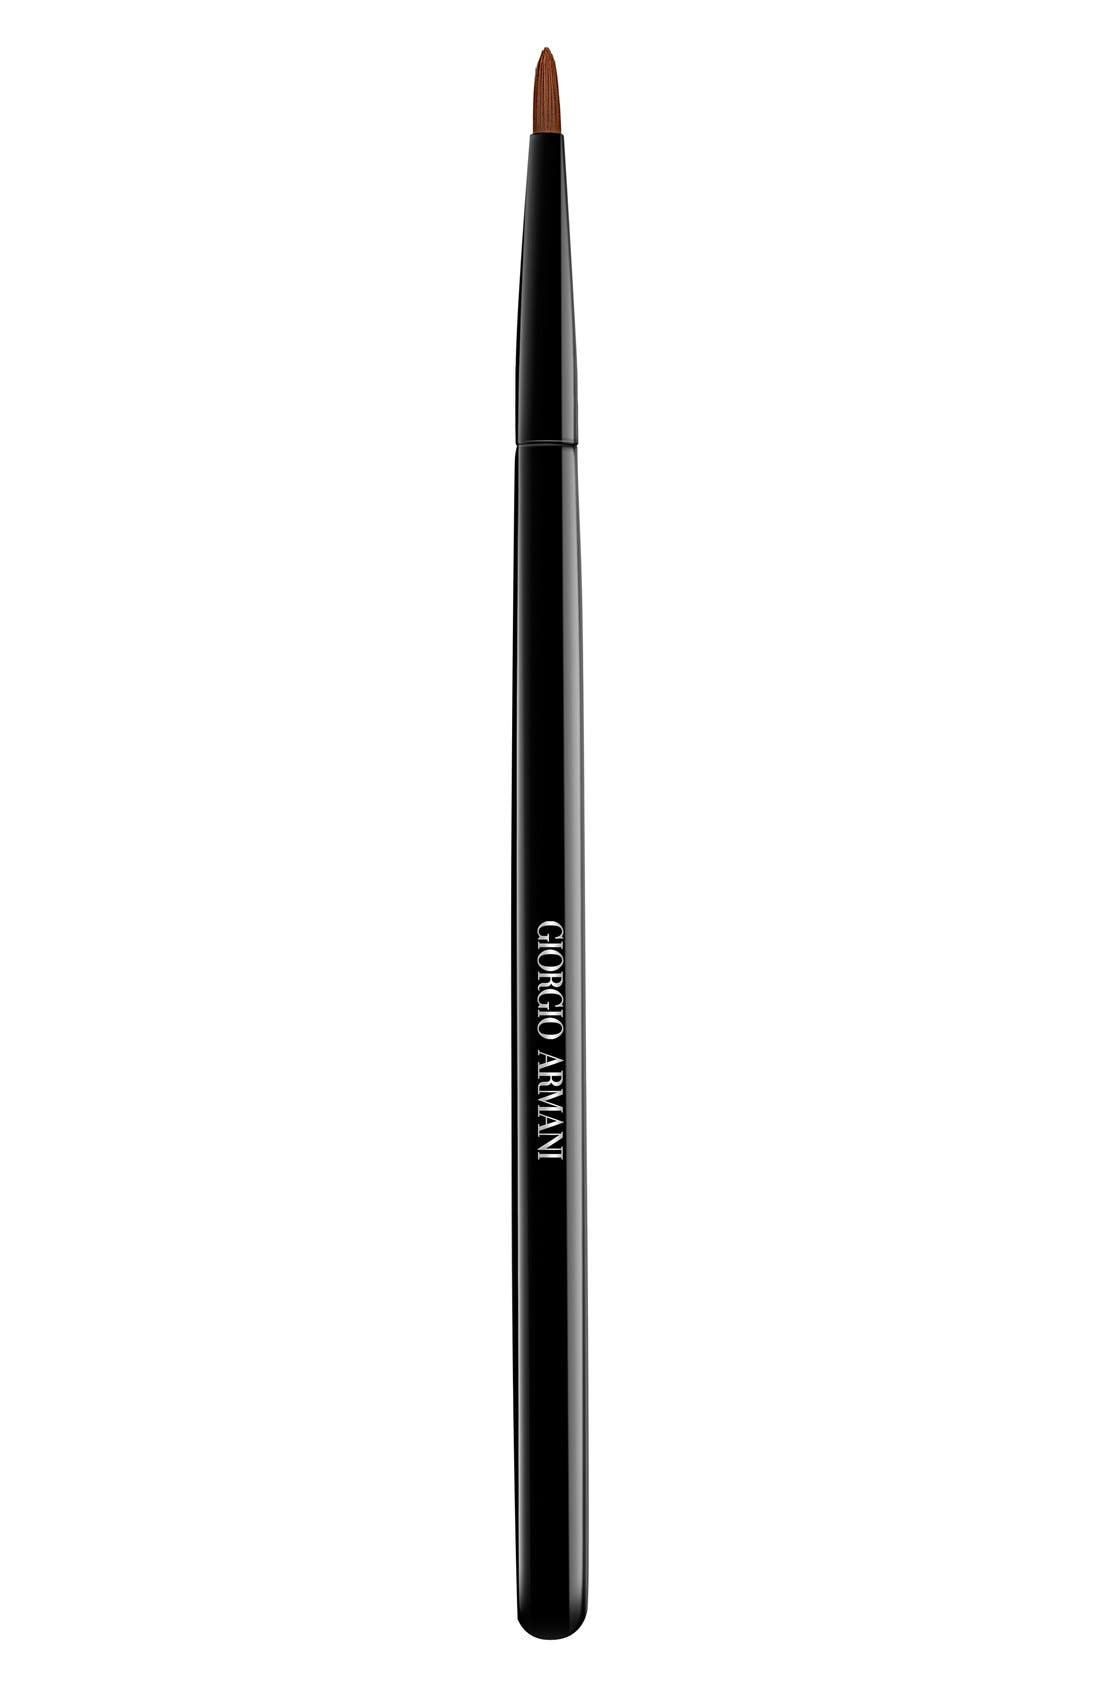 'Maestro' Eyeliner Brush,                         Main,                         color, 000